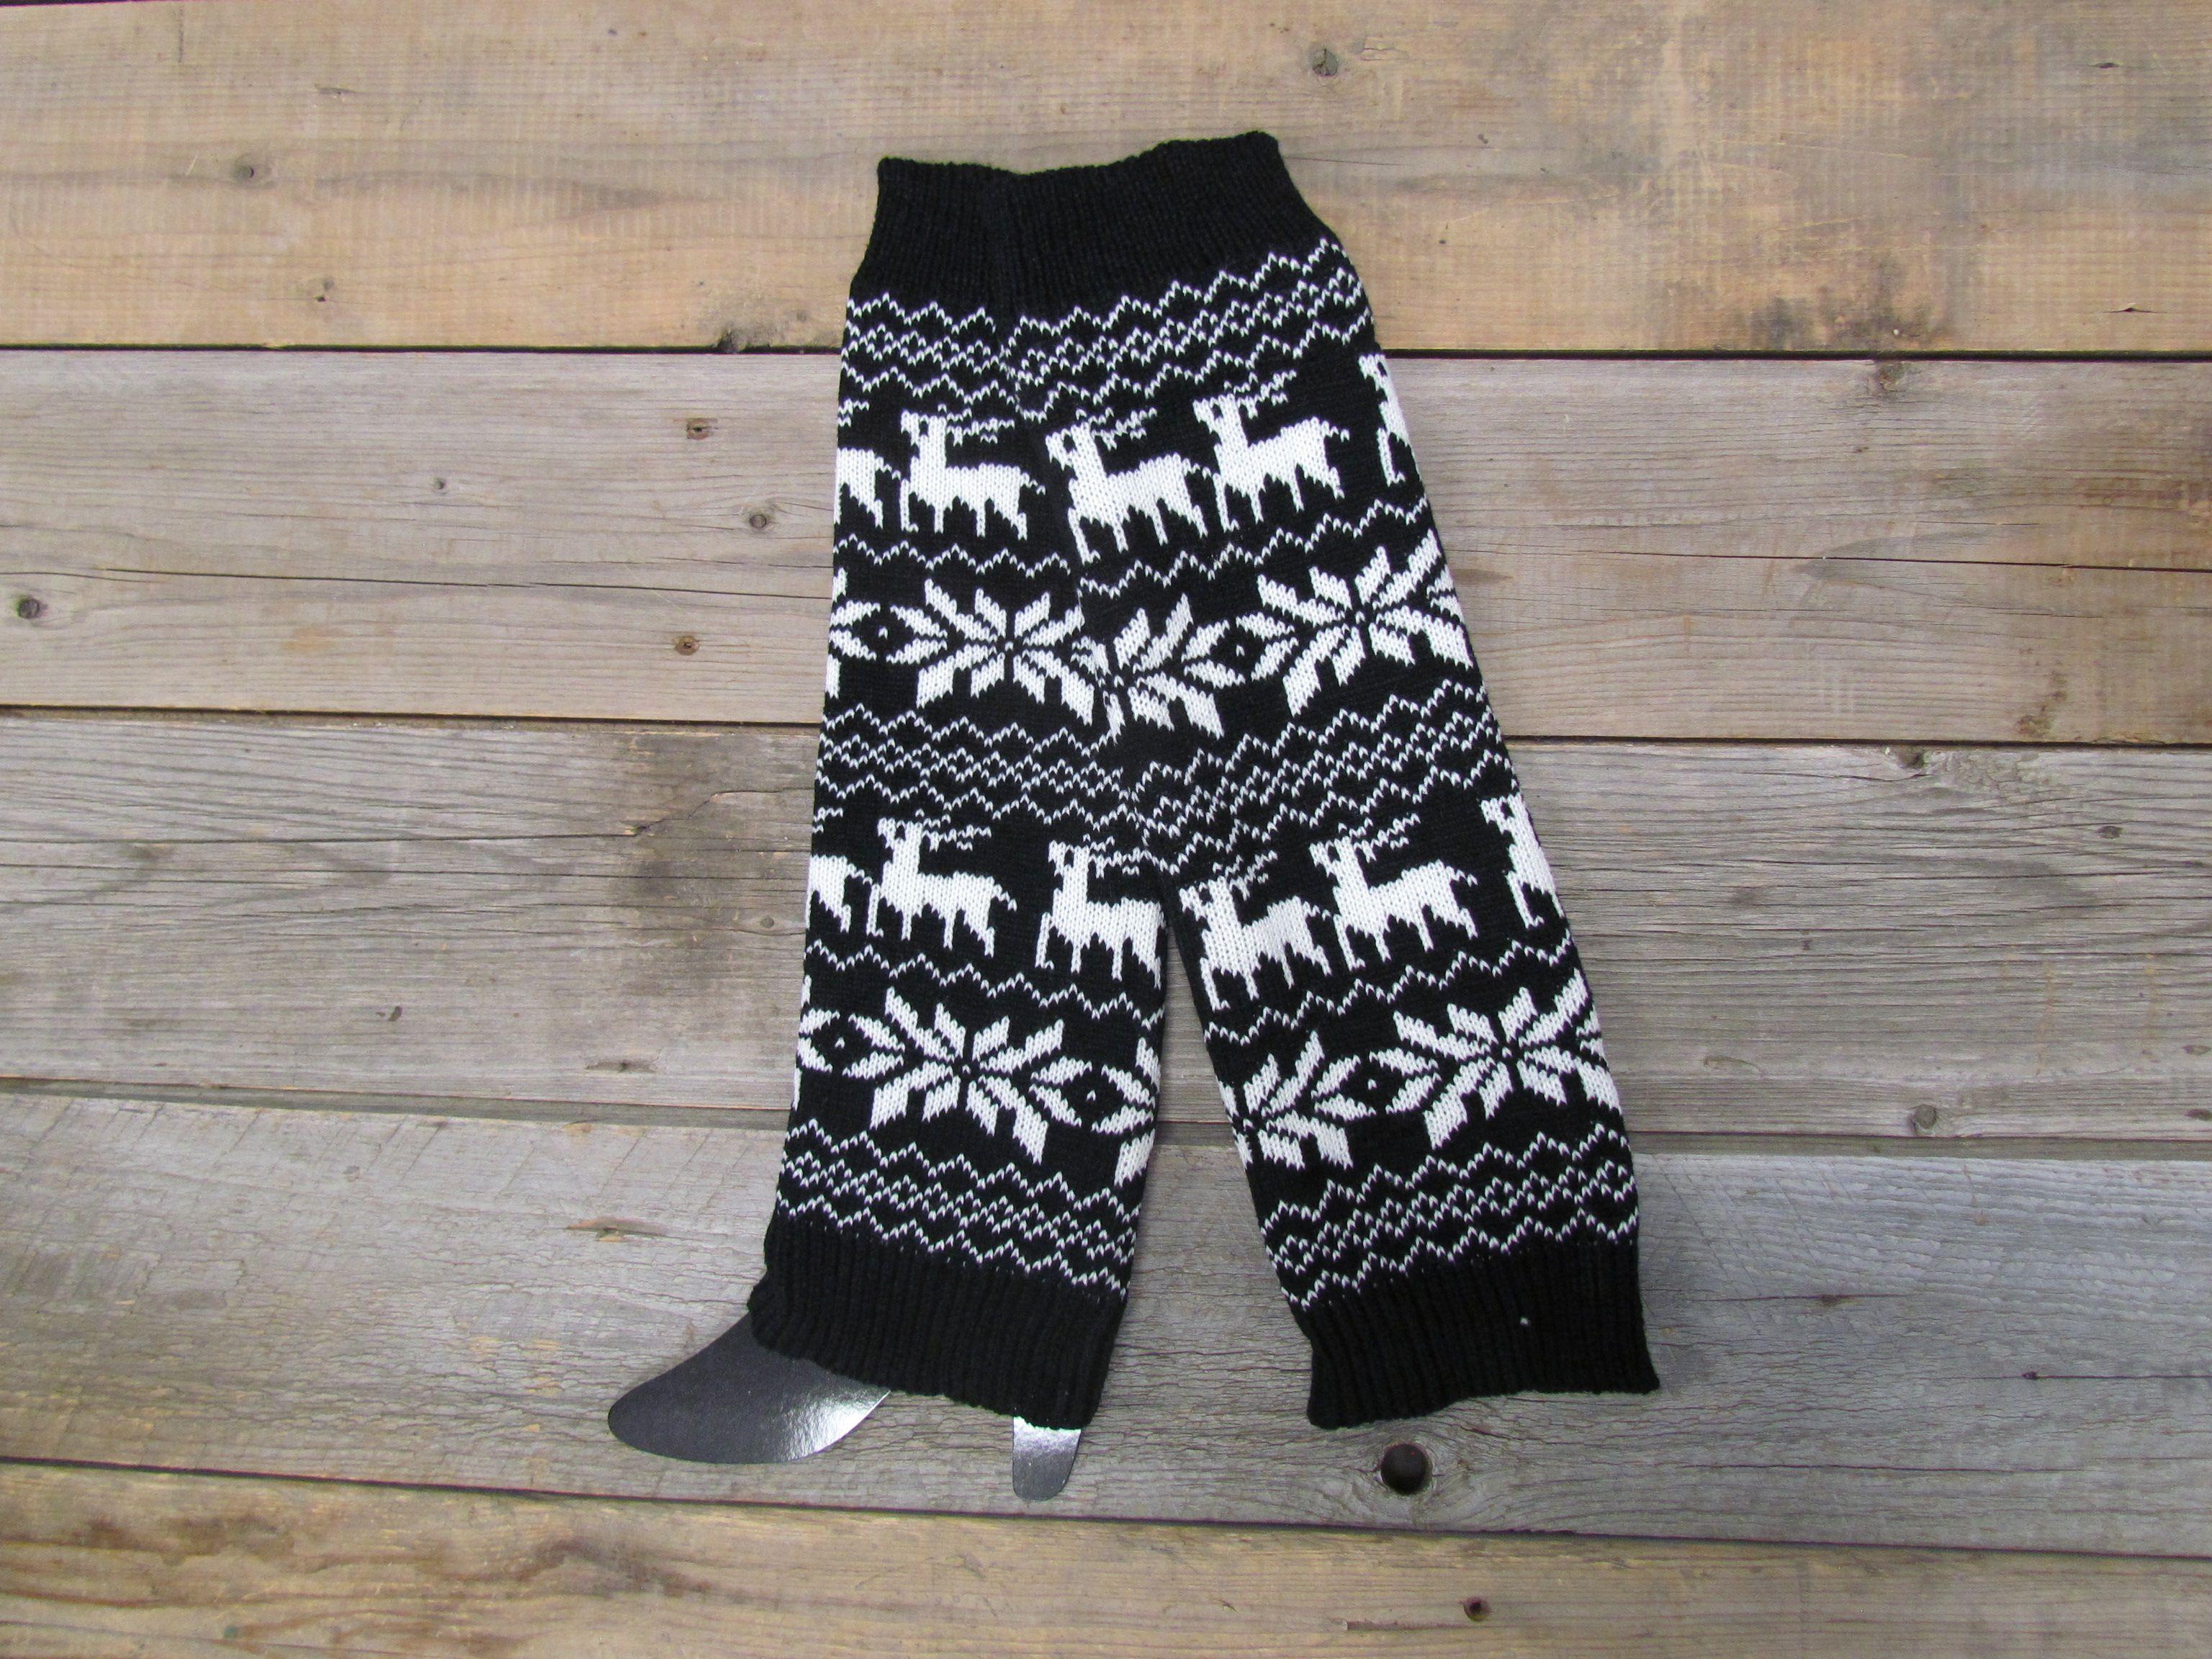 87b66dcb3a20af Black Reindeer Leg Warmers. Black Reindeer Leg Warmers North Design,  Buttery Soft Leggings ...